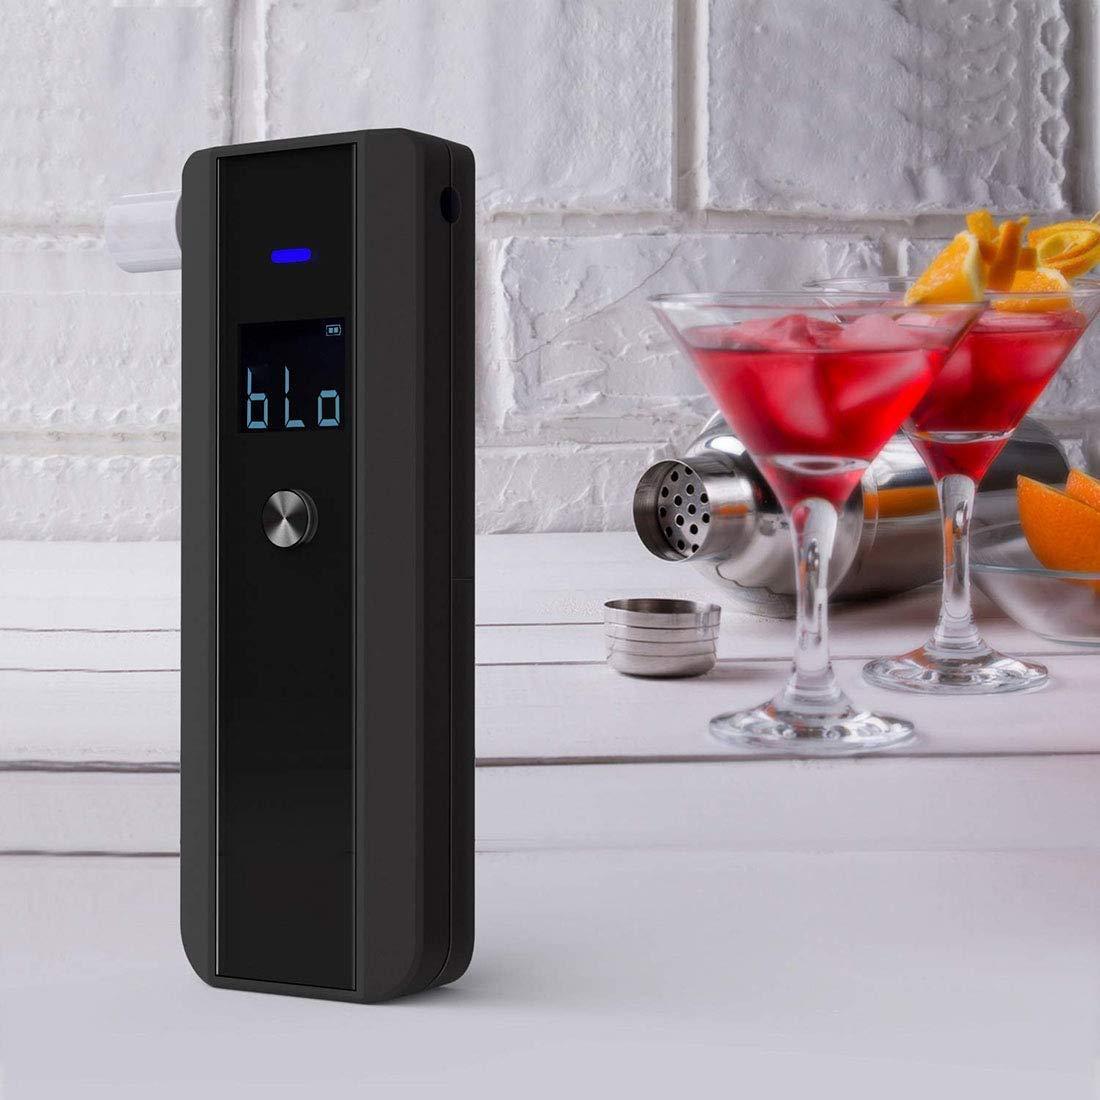 Precisi/ón de Nivel Profesional DWLXSH alcohol/ímetro Aliento port/átil probador del Alcohol for Uso Personal y Profesional